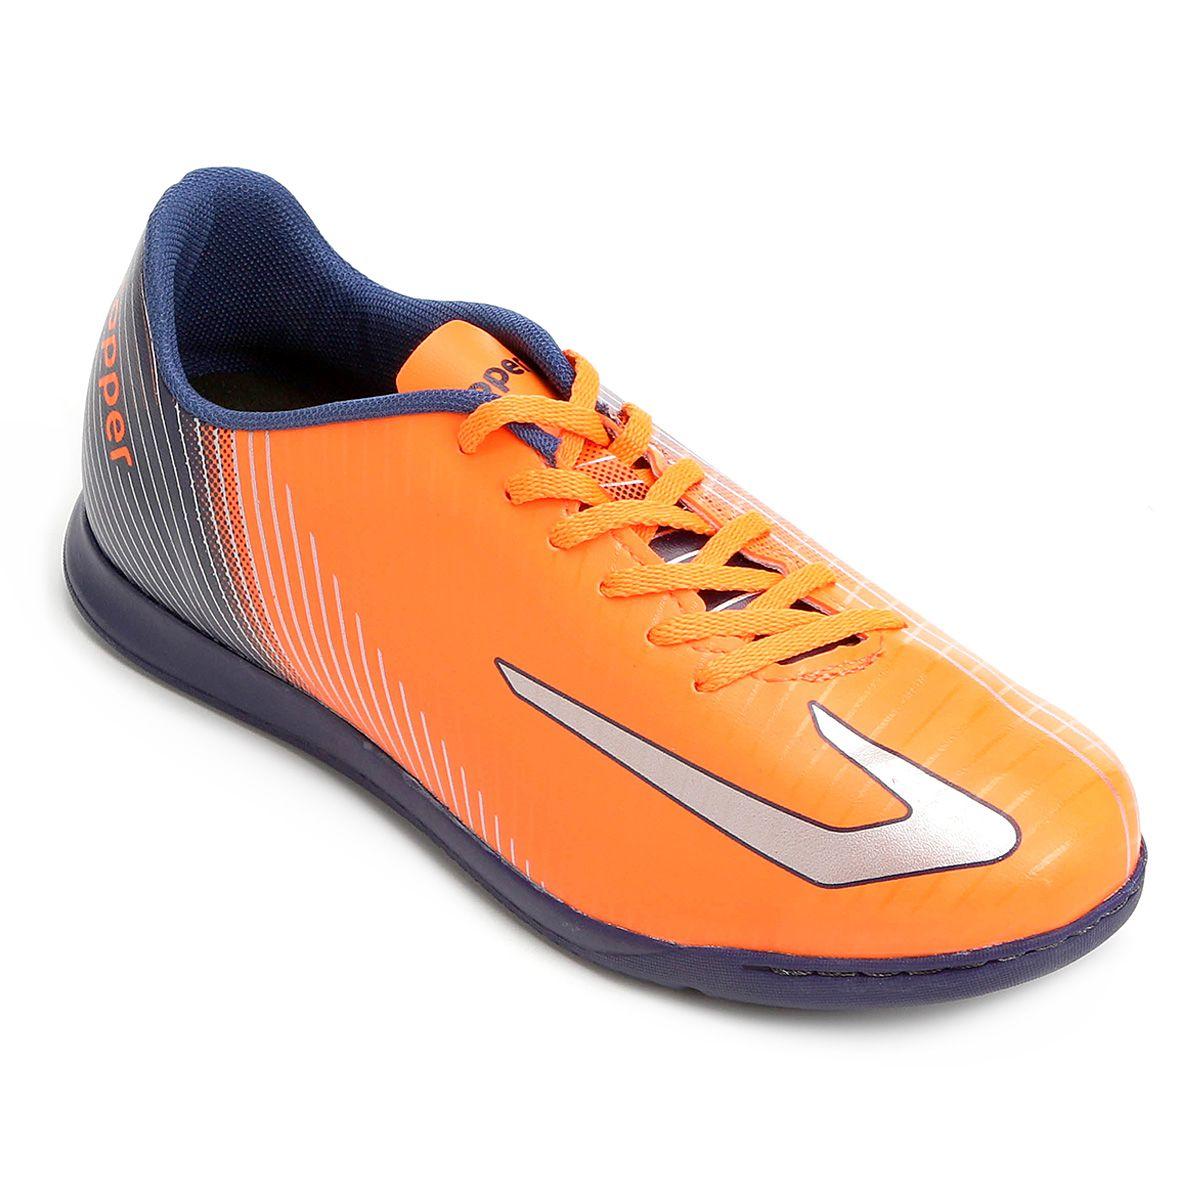 Chuteira Topper Ultra Indoor Futsal Masculino 4200409